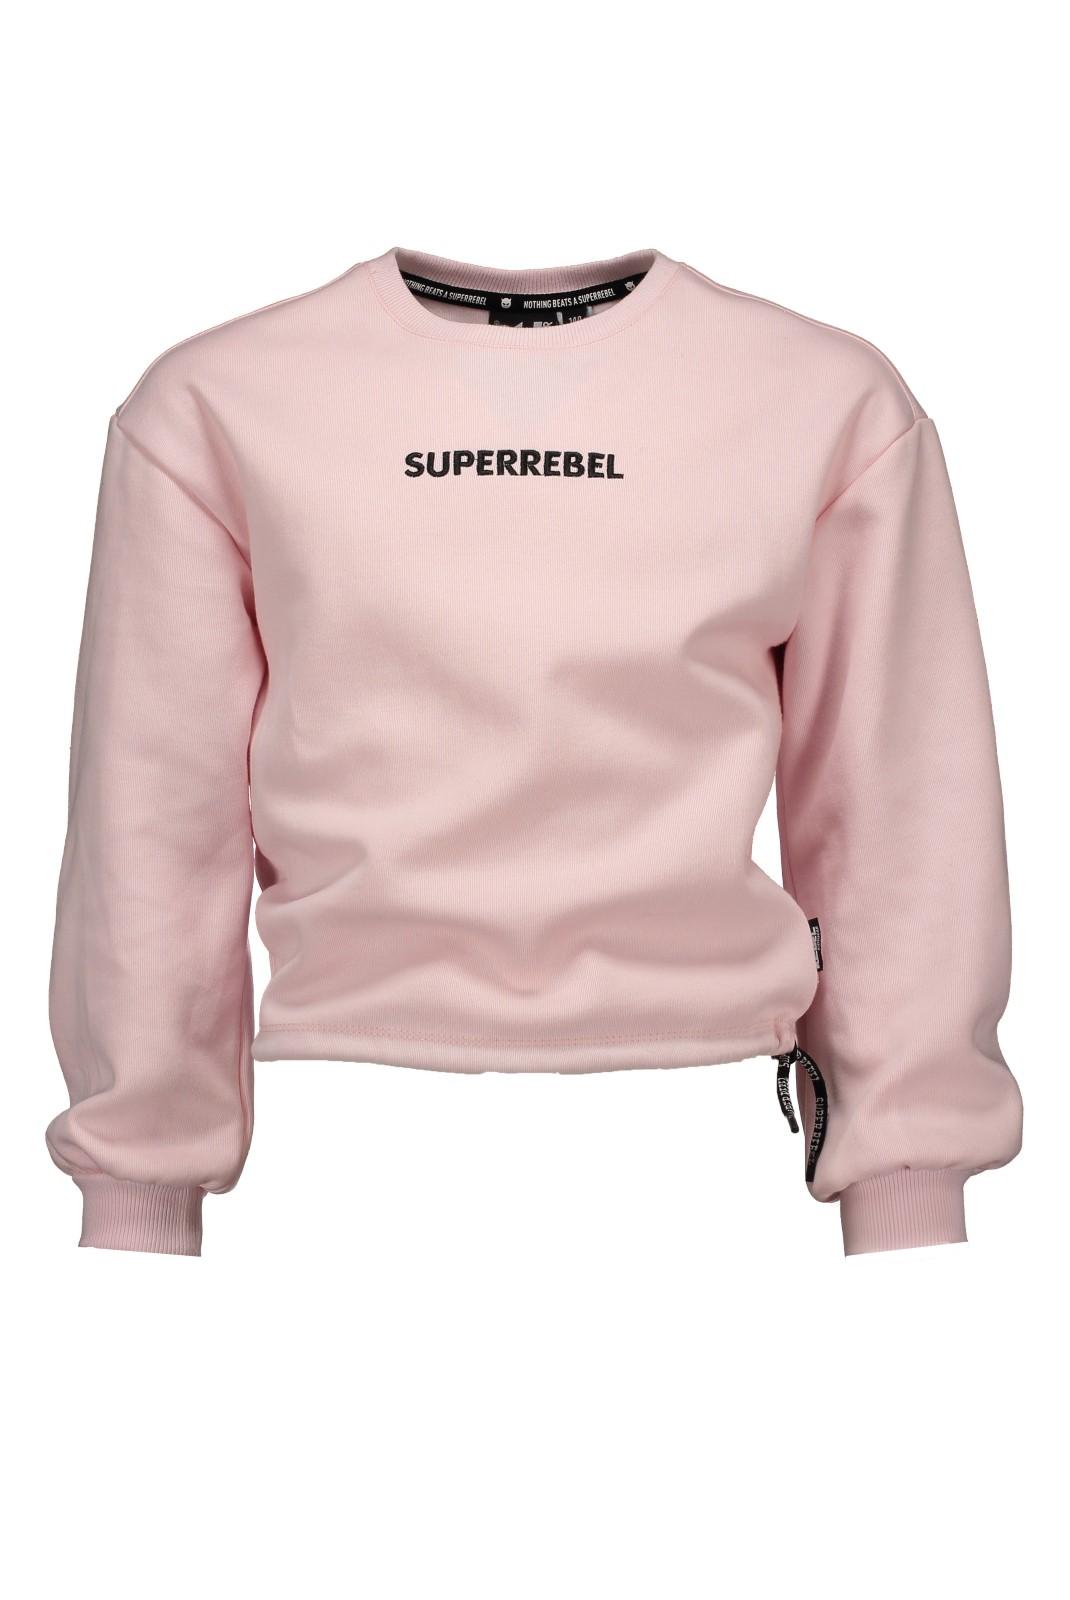 Superrebel Girls Spoof Sweater 2022